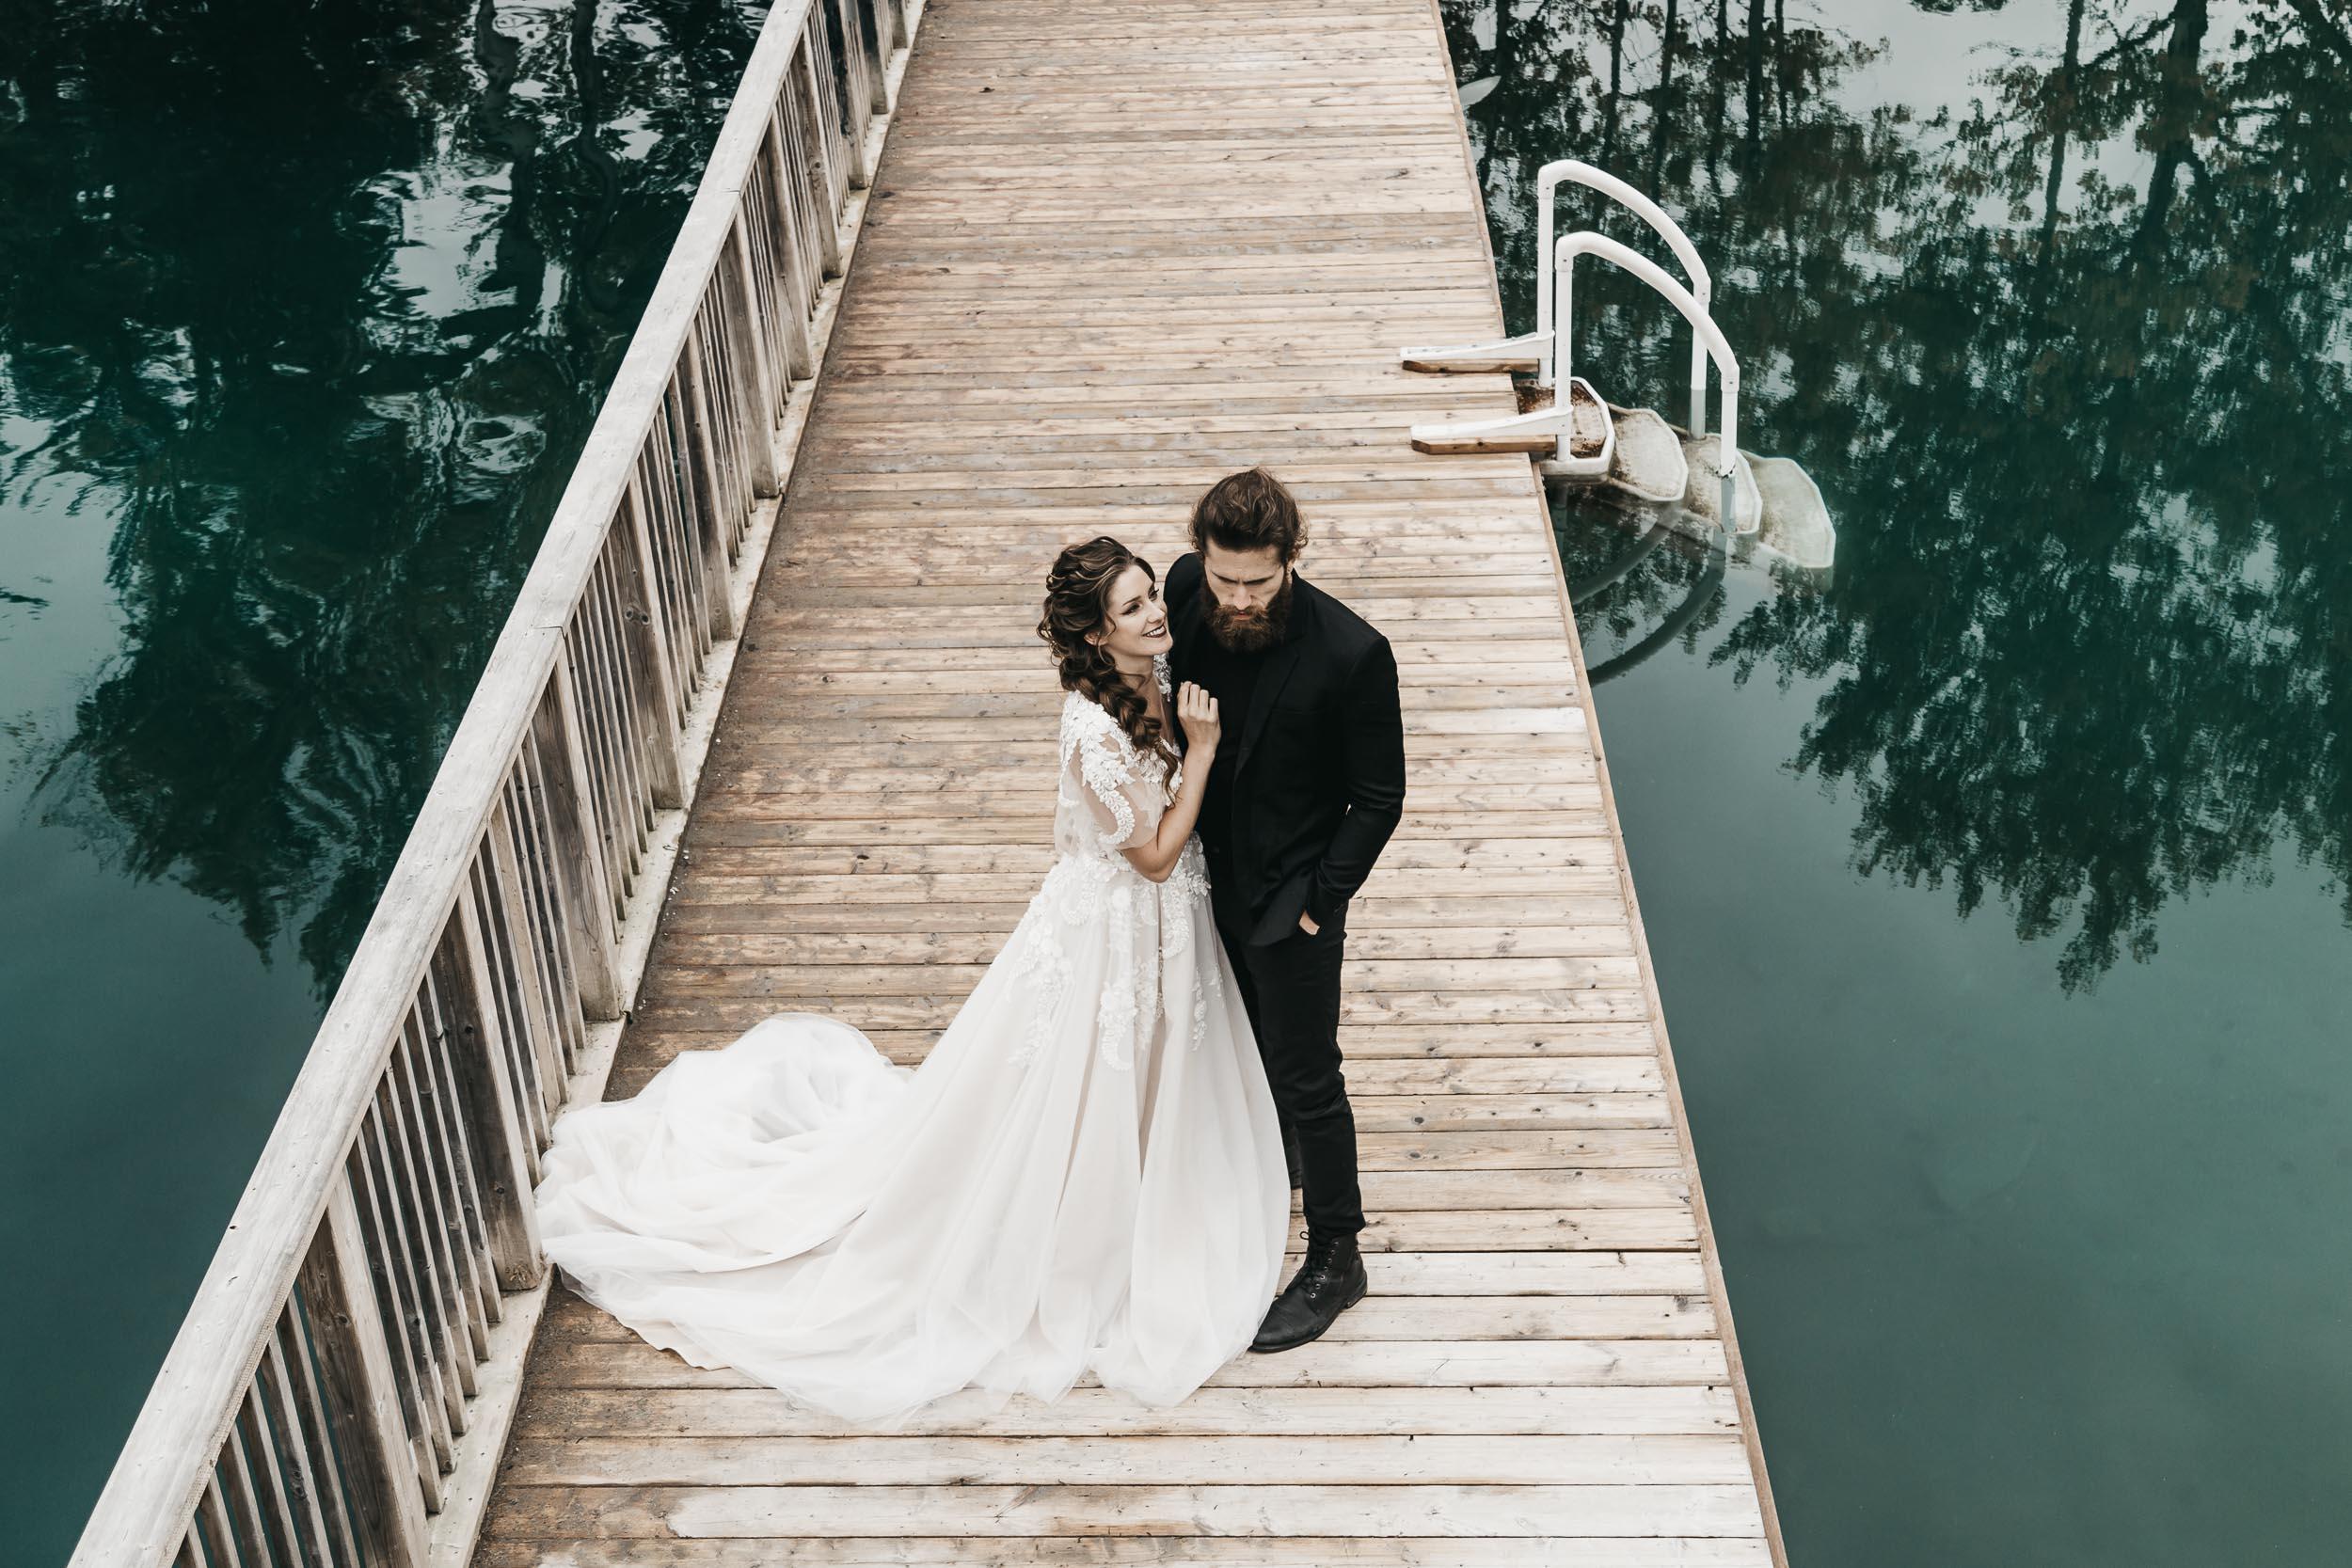 intimate-wedding-elopement-photographer-ottawa-toronto-9990.jpg